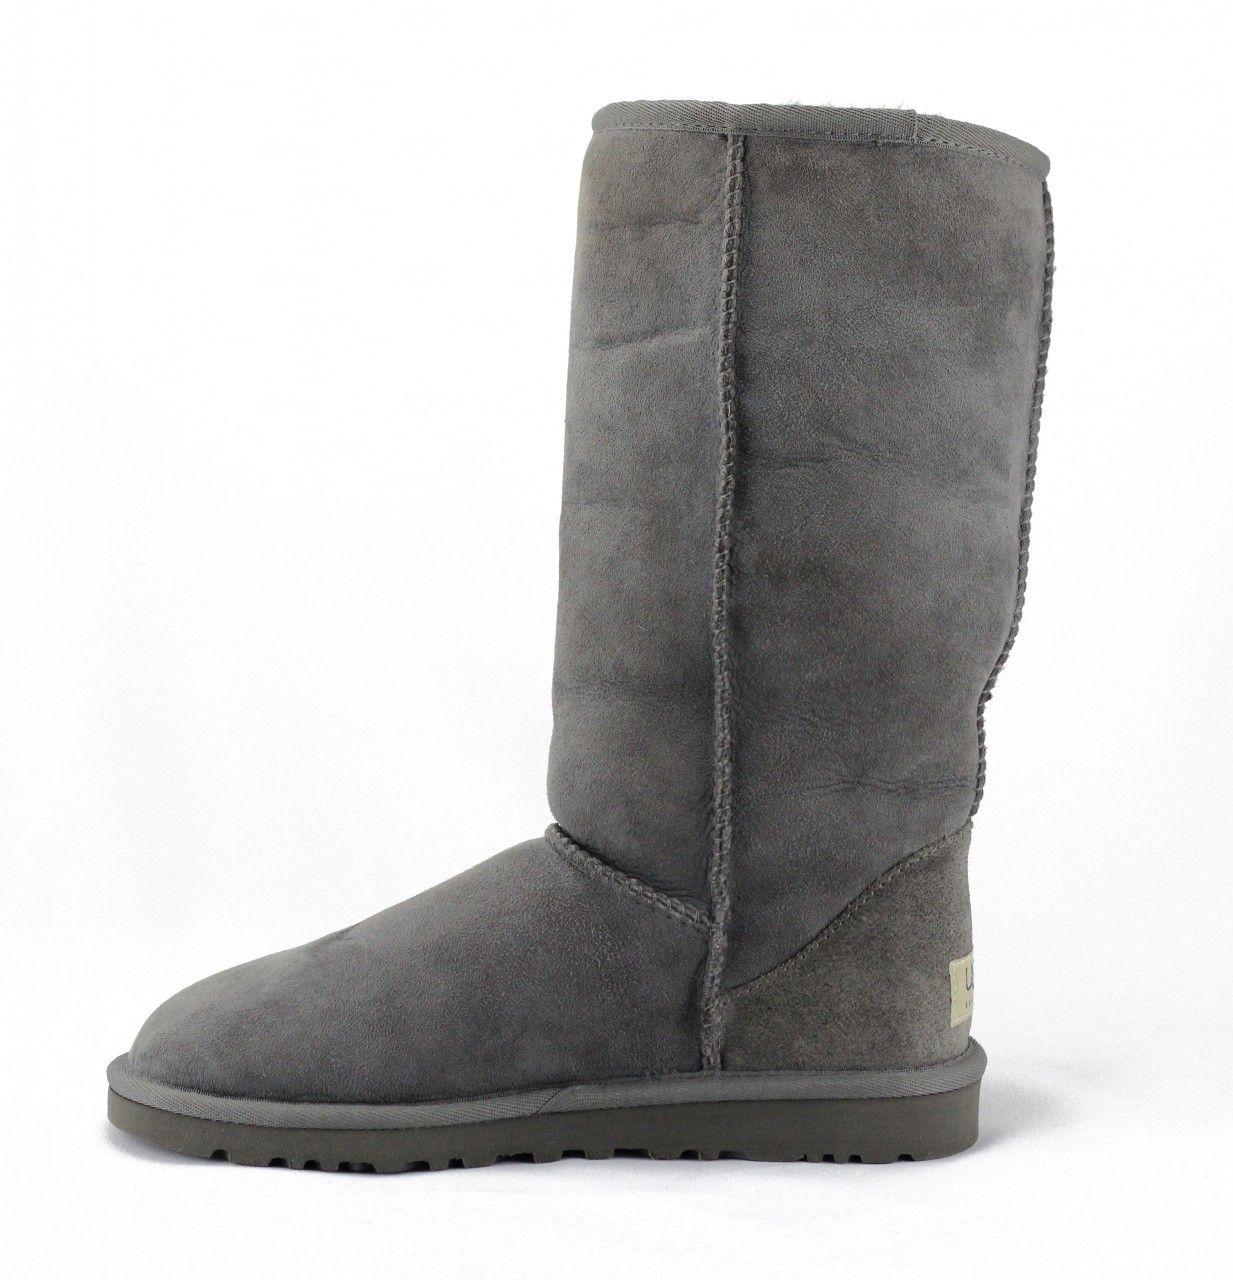 b0f2813f5cf Ugg Australia Ugg Australia For Women: Classic Tall Grey Boots Grey ...